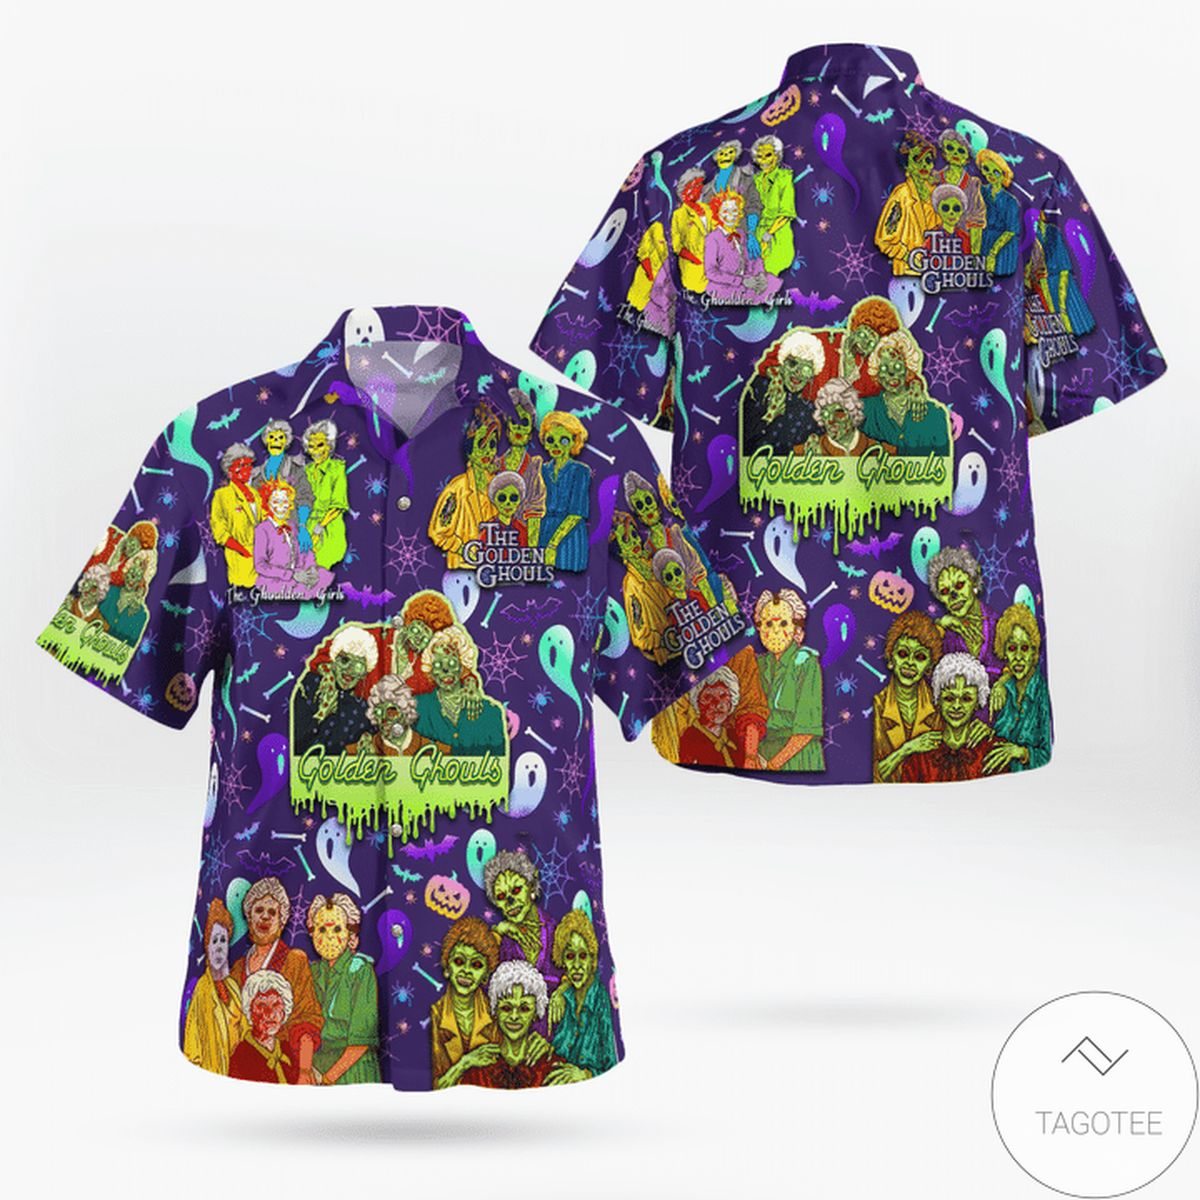 The Golden Ghouls Hawaiian Shirt